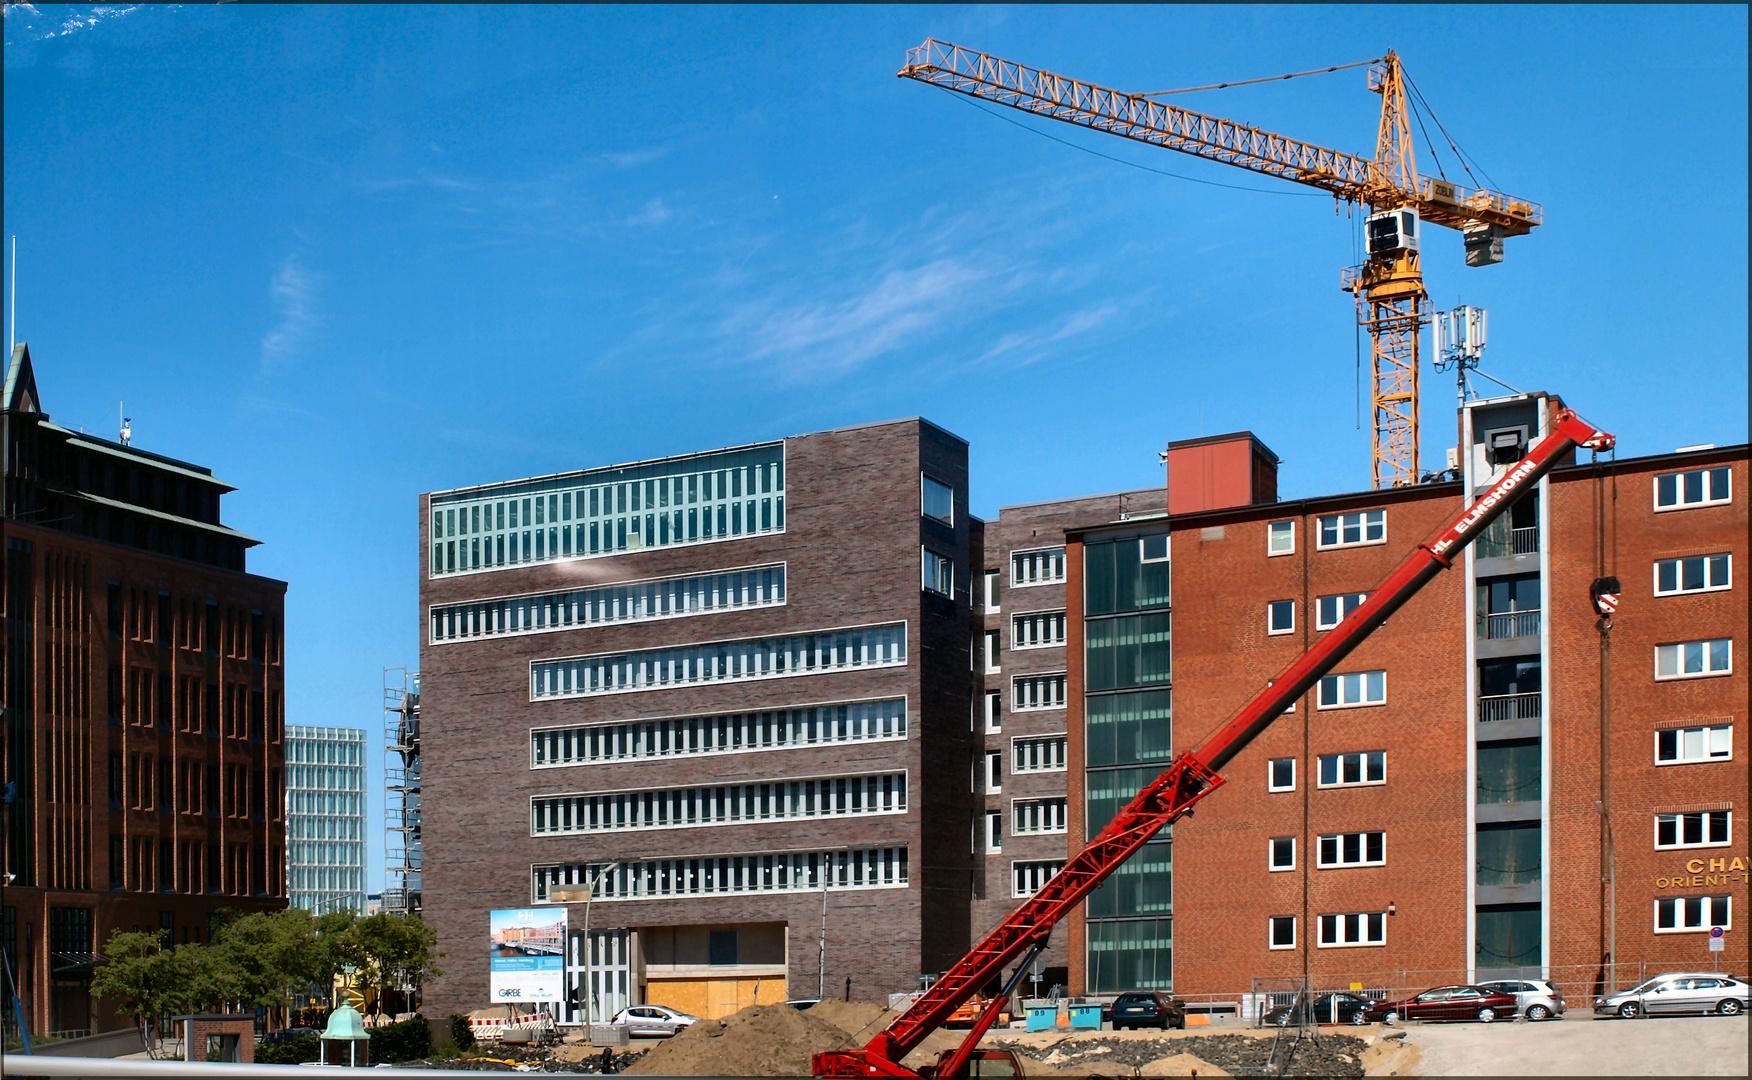 Hamburg Is Growing Foto % Immagini